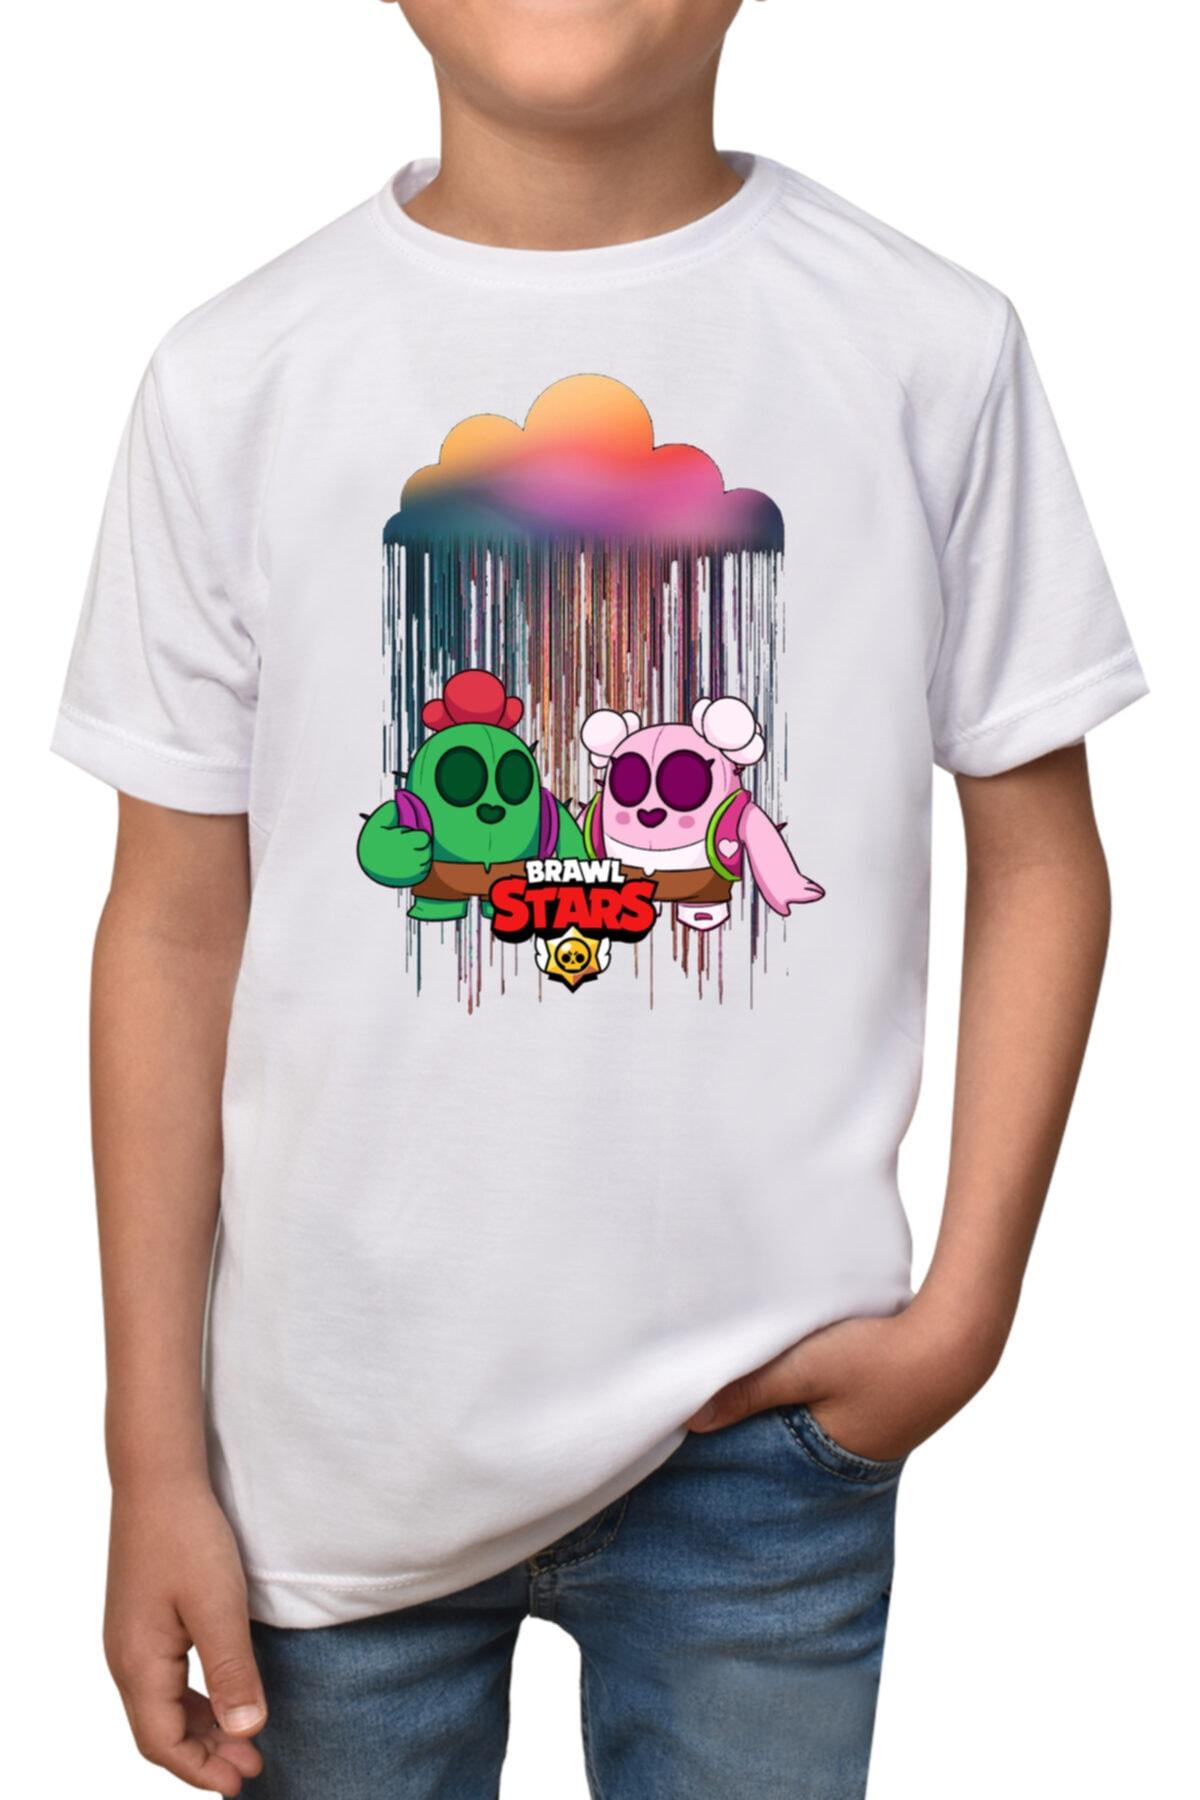 Brawl Stars - Beyaz Çocuk - Yetişkin Unisex T-shirt T-3